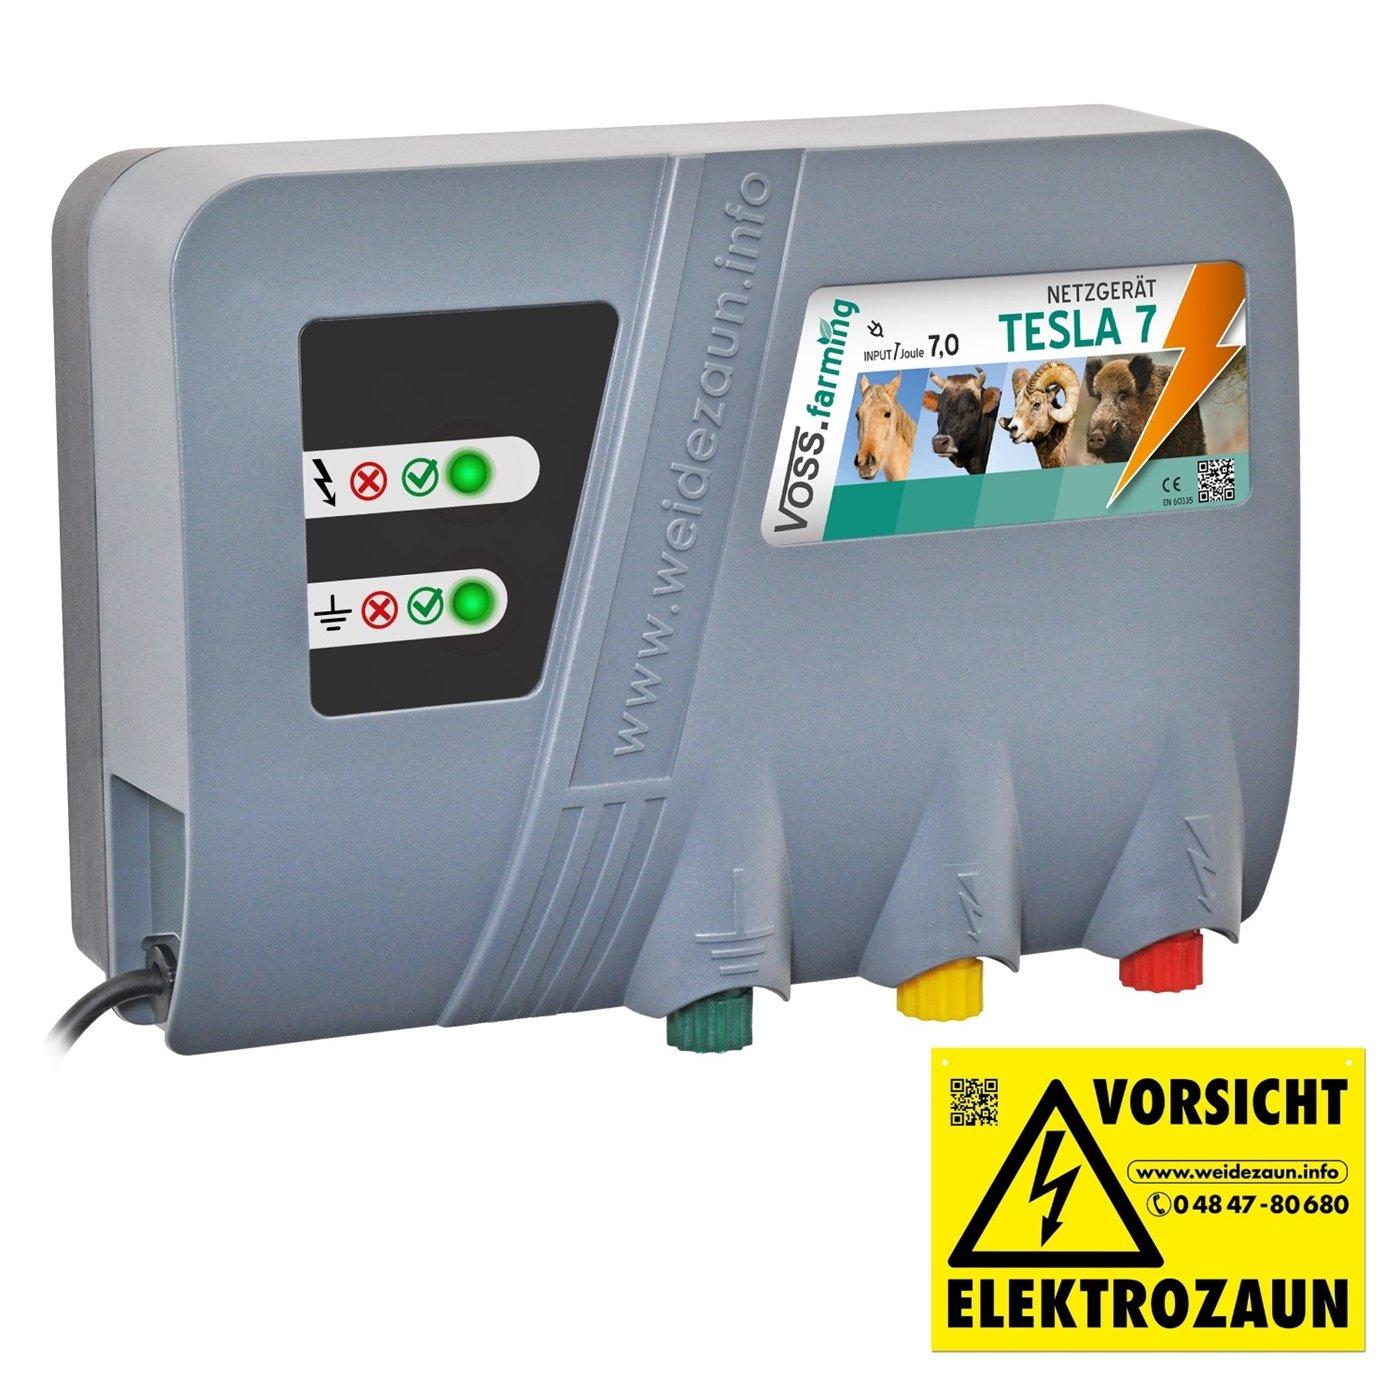 VOSS.farming Weidezaungerät Tesla 7 Duo Extra Power: 230 V, 10000 Volt, 7 Joule, für Lange Zäune, Starker Bewuchs Elektrozaungerät 230 V Pferd für Lange Zäune